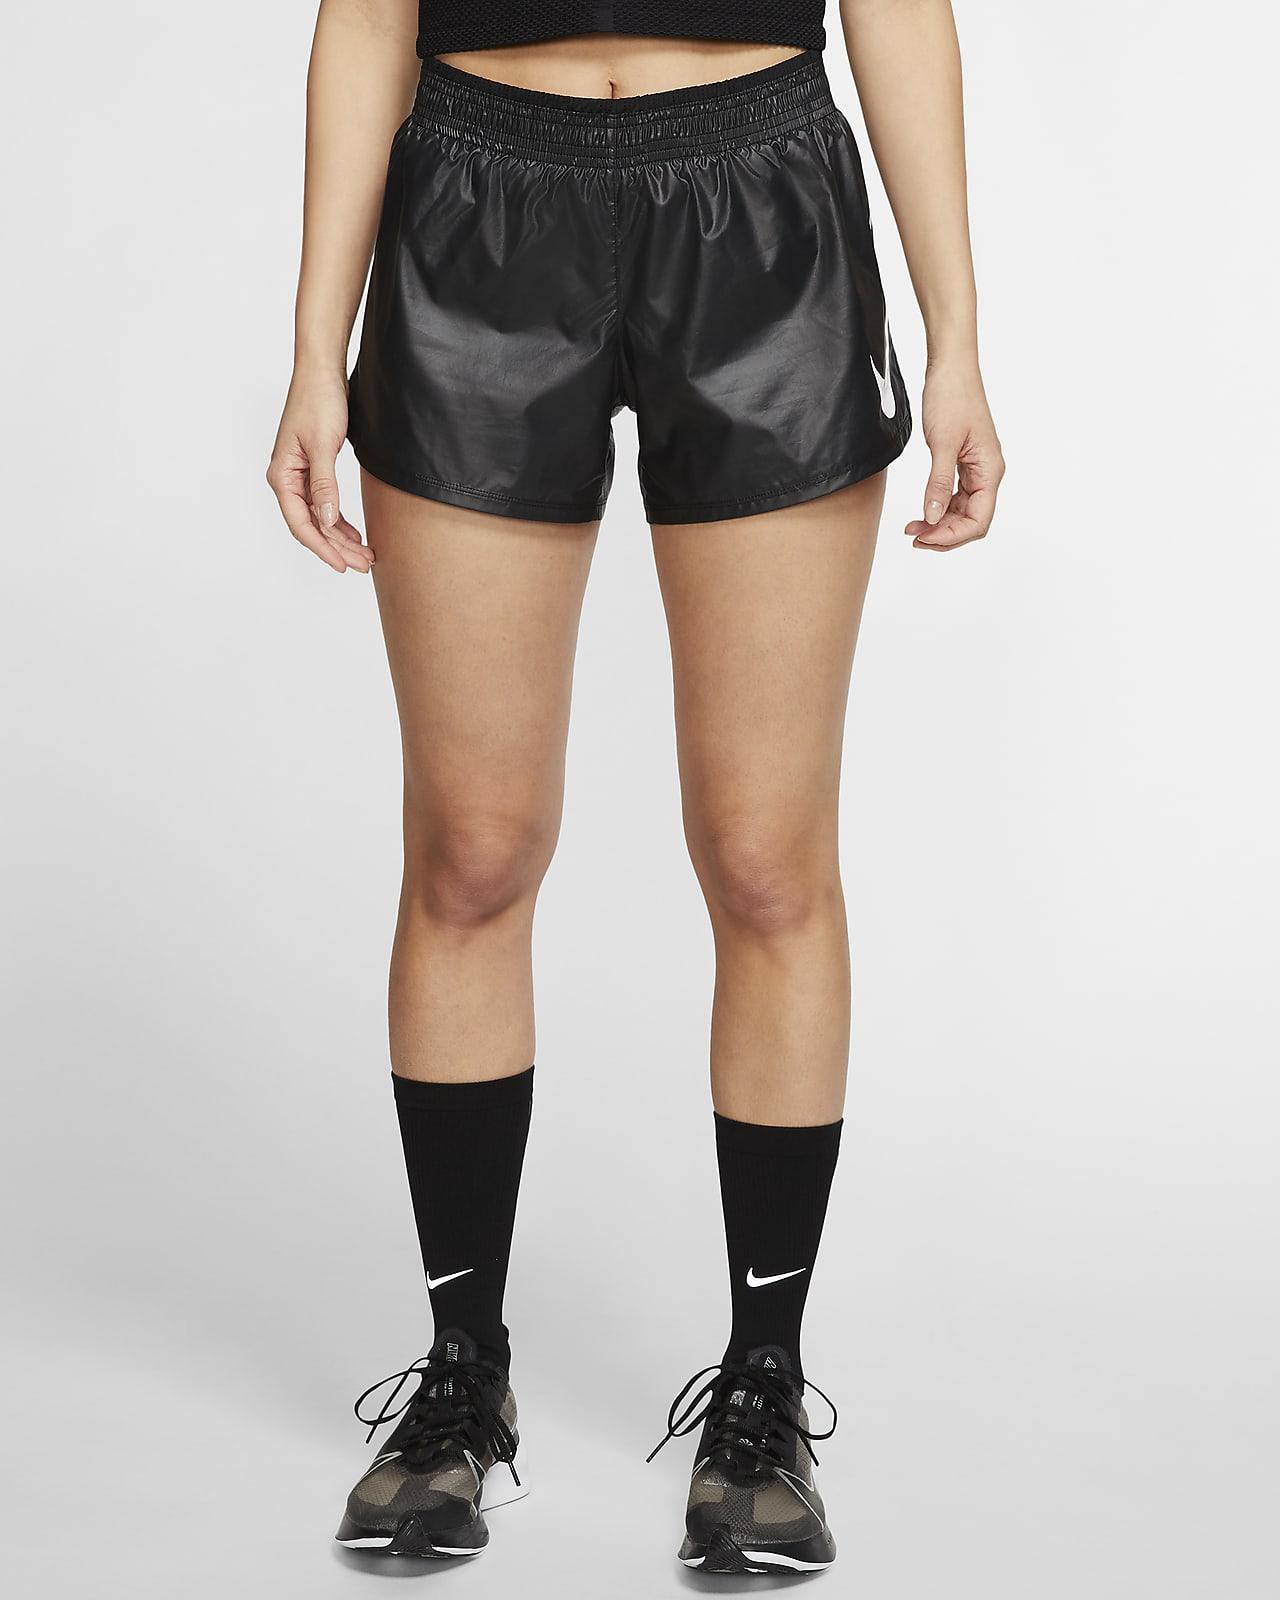 Nike Women's Running Shorts. Nike SG